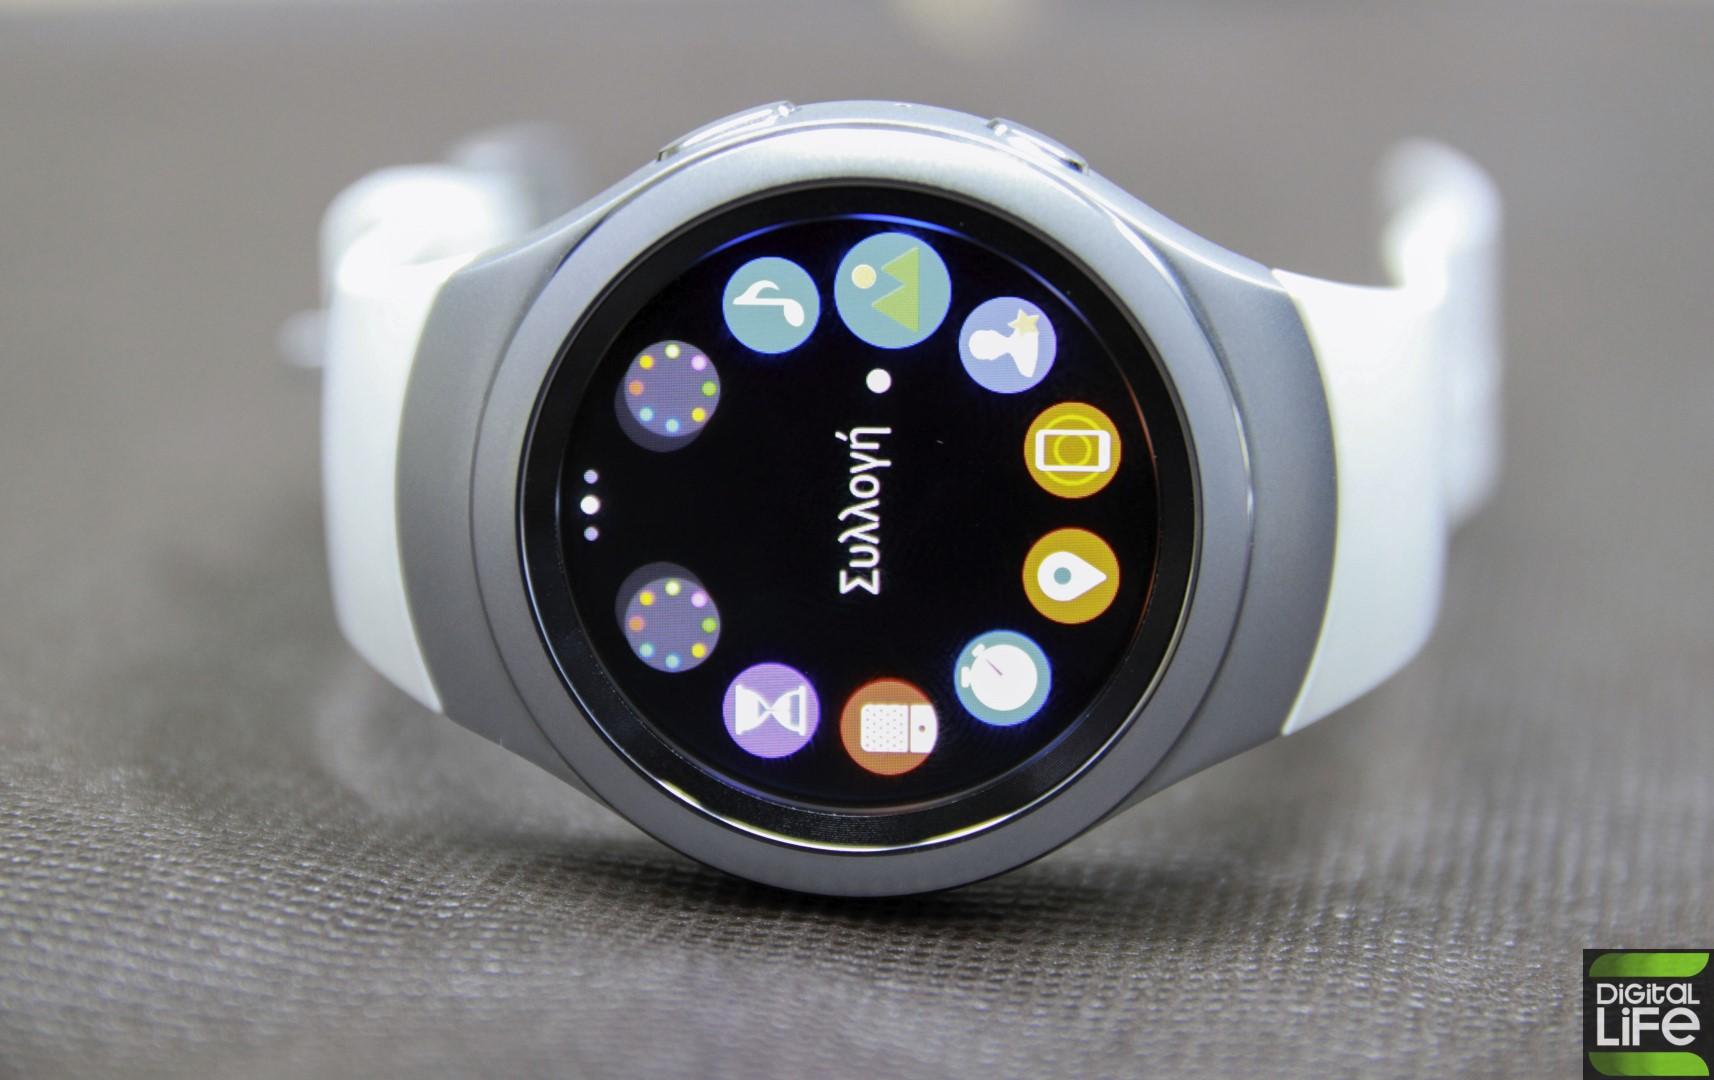 Samsung Gear S2 hands-on: Το smartwatch όπως πρέπει να είναι!